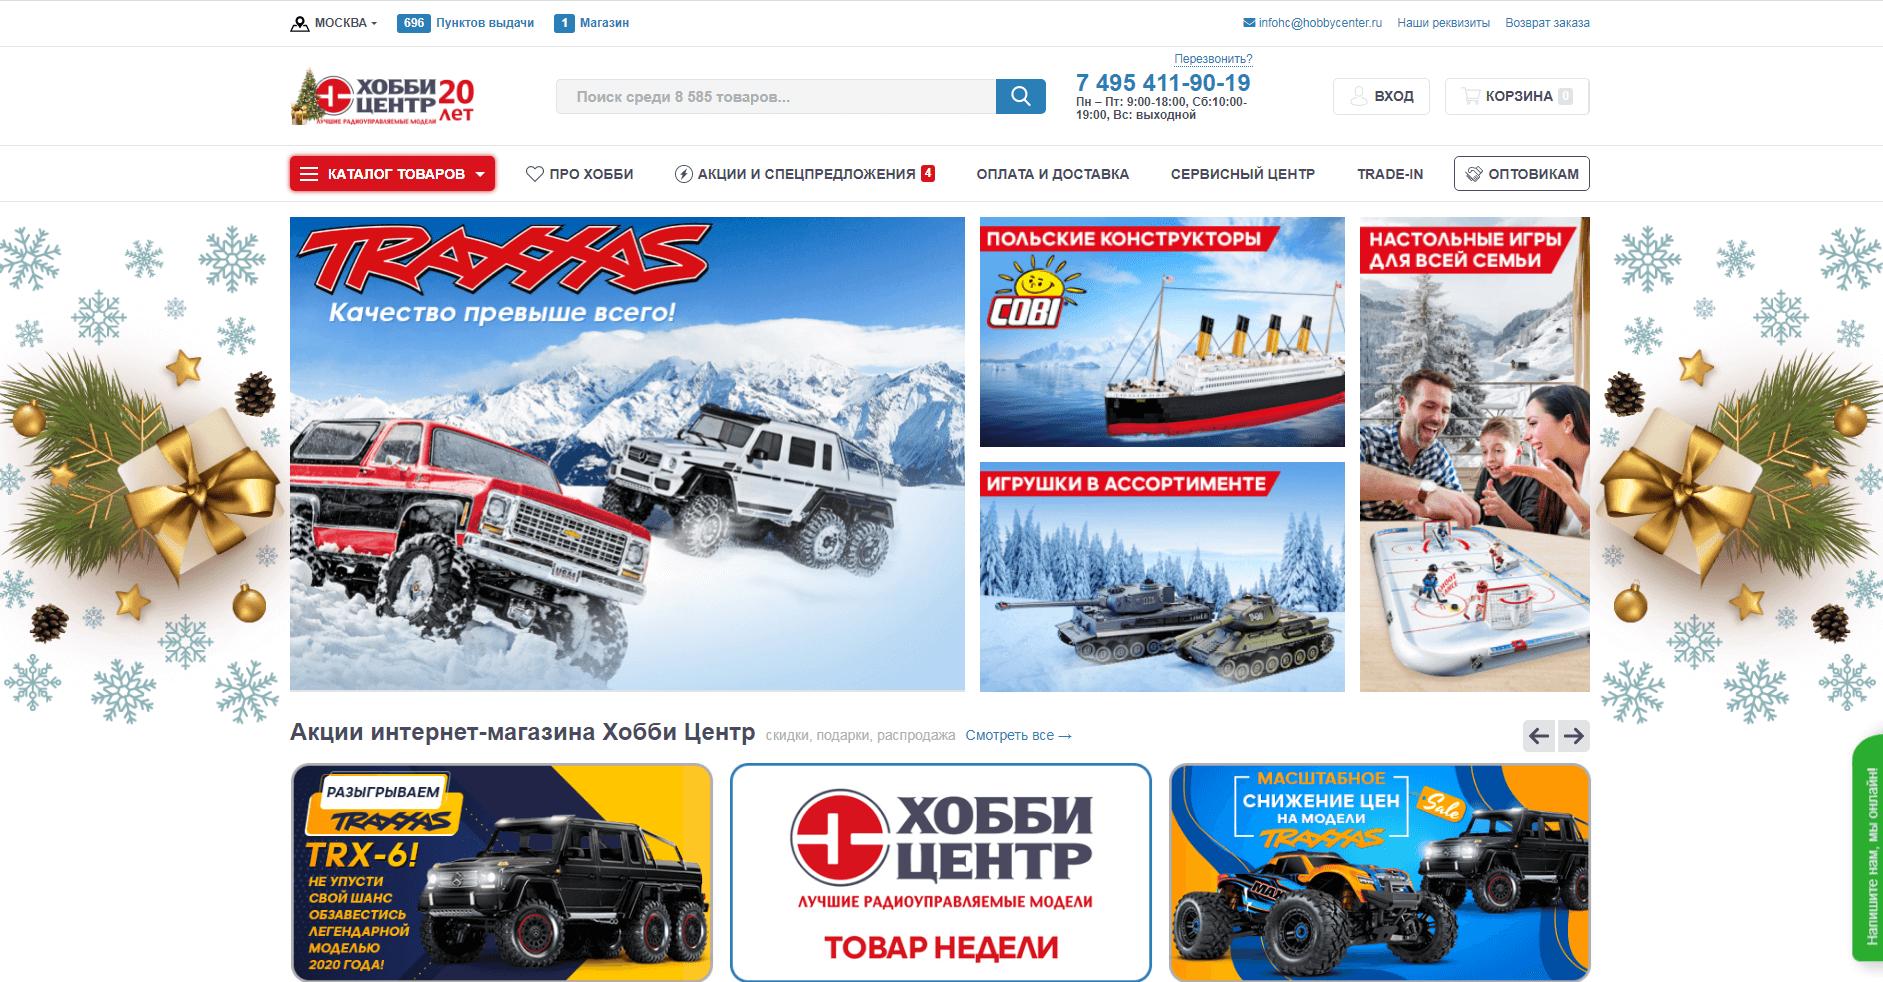 hobbycenter.ru website